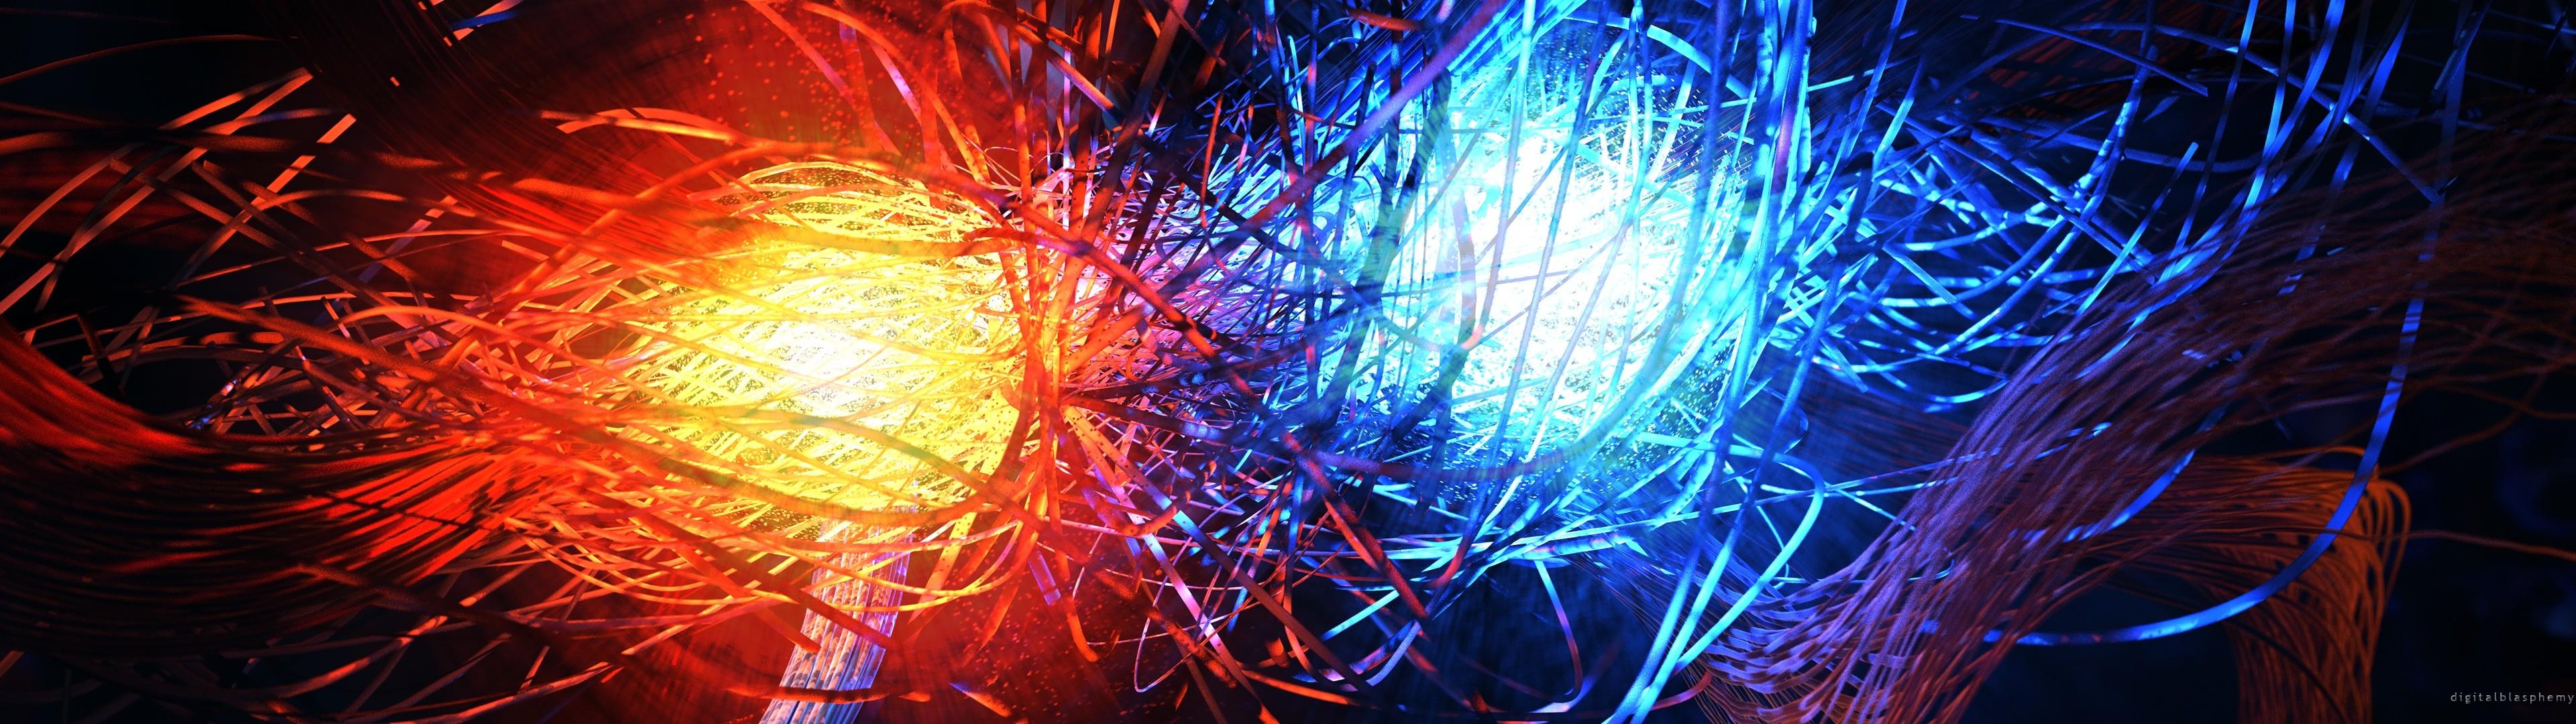 General 3840x1080 abstract fire ice digital art Digital Glowing CGI shapes swirls